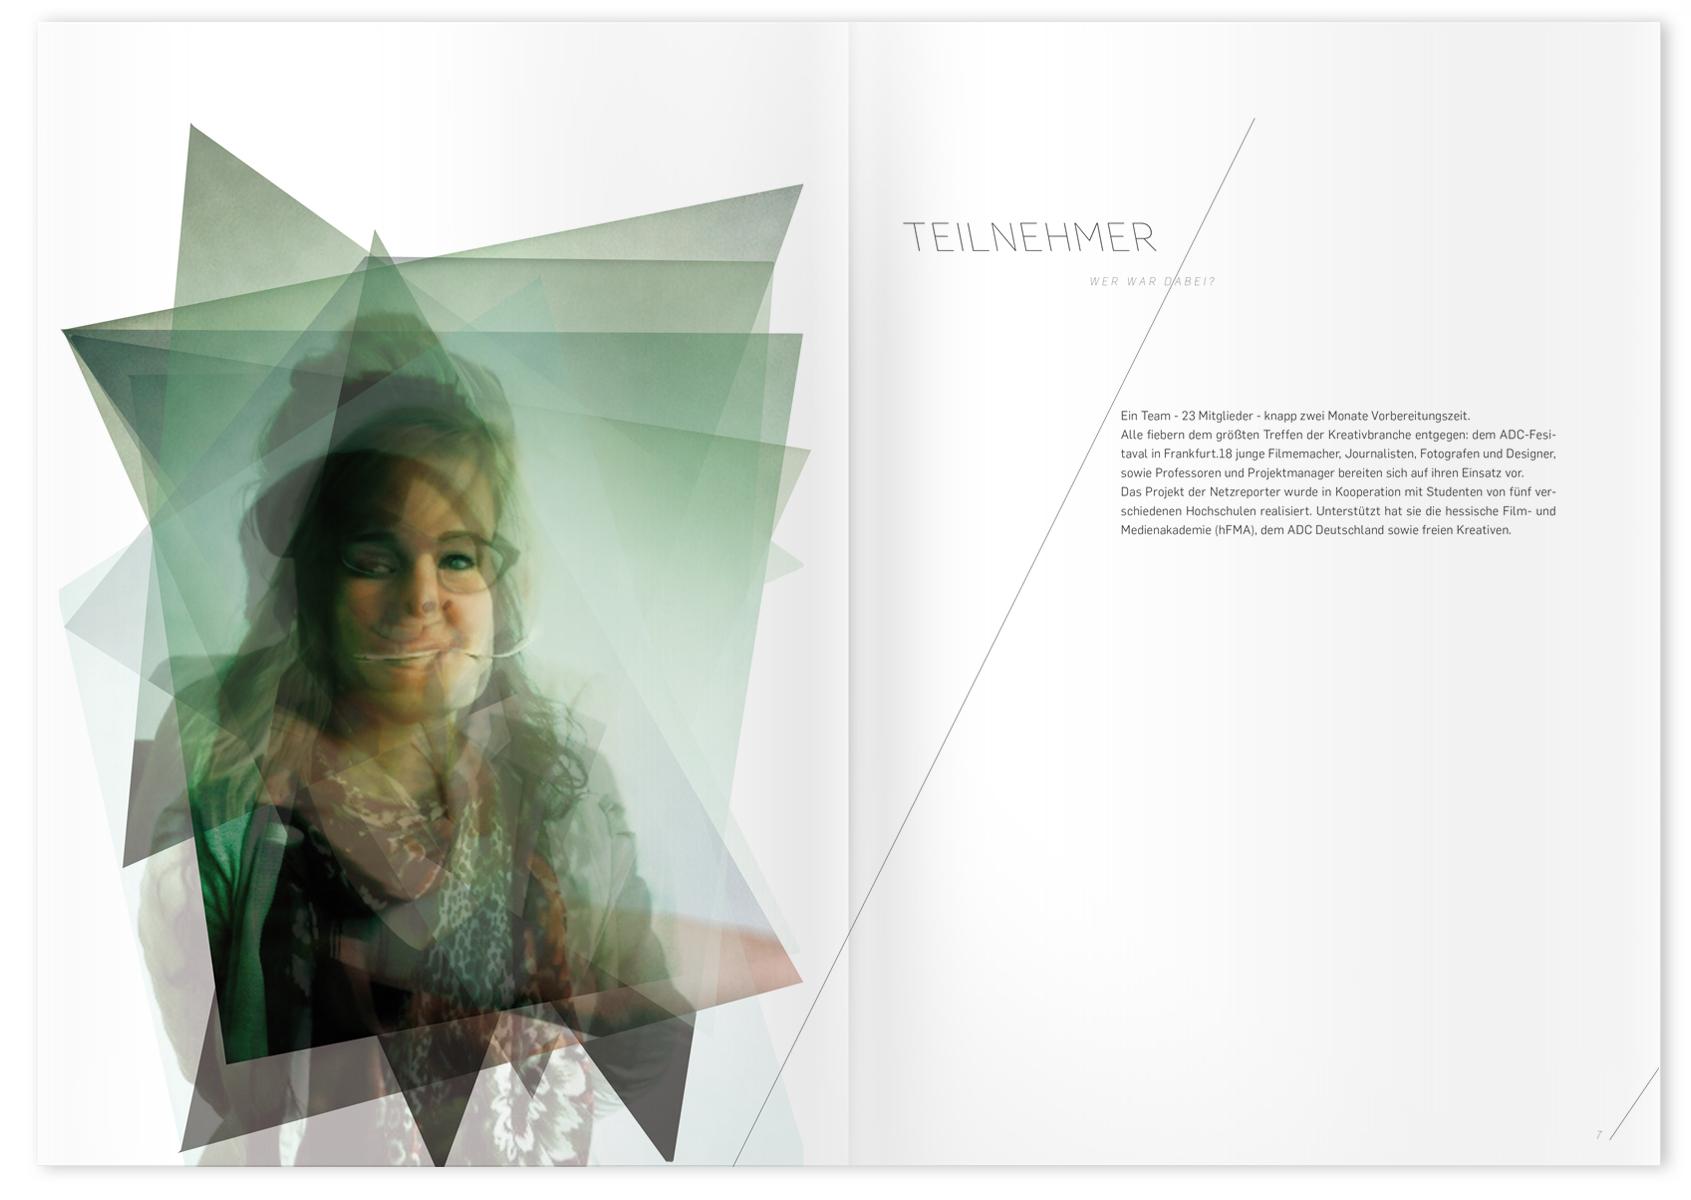 10_hFMA Netzreporter_ADC Festival_Editorial Design_Grafikdesign_Gloria Kison.jpg